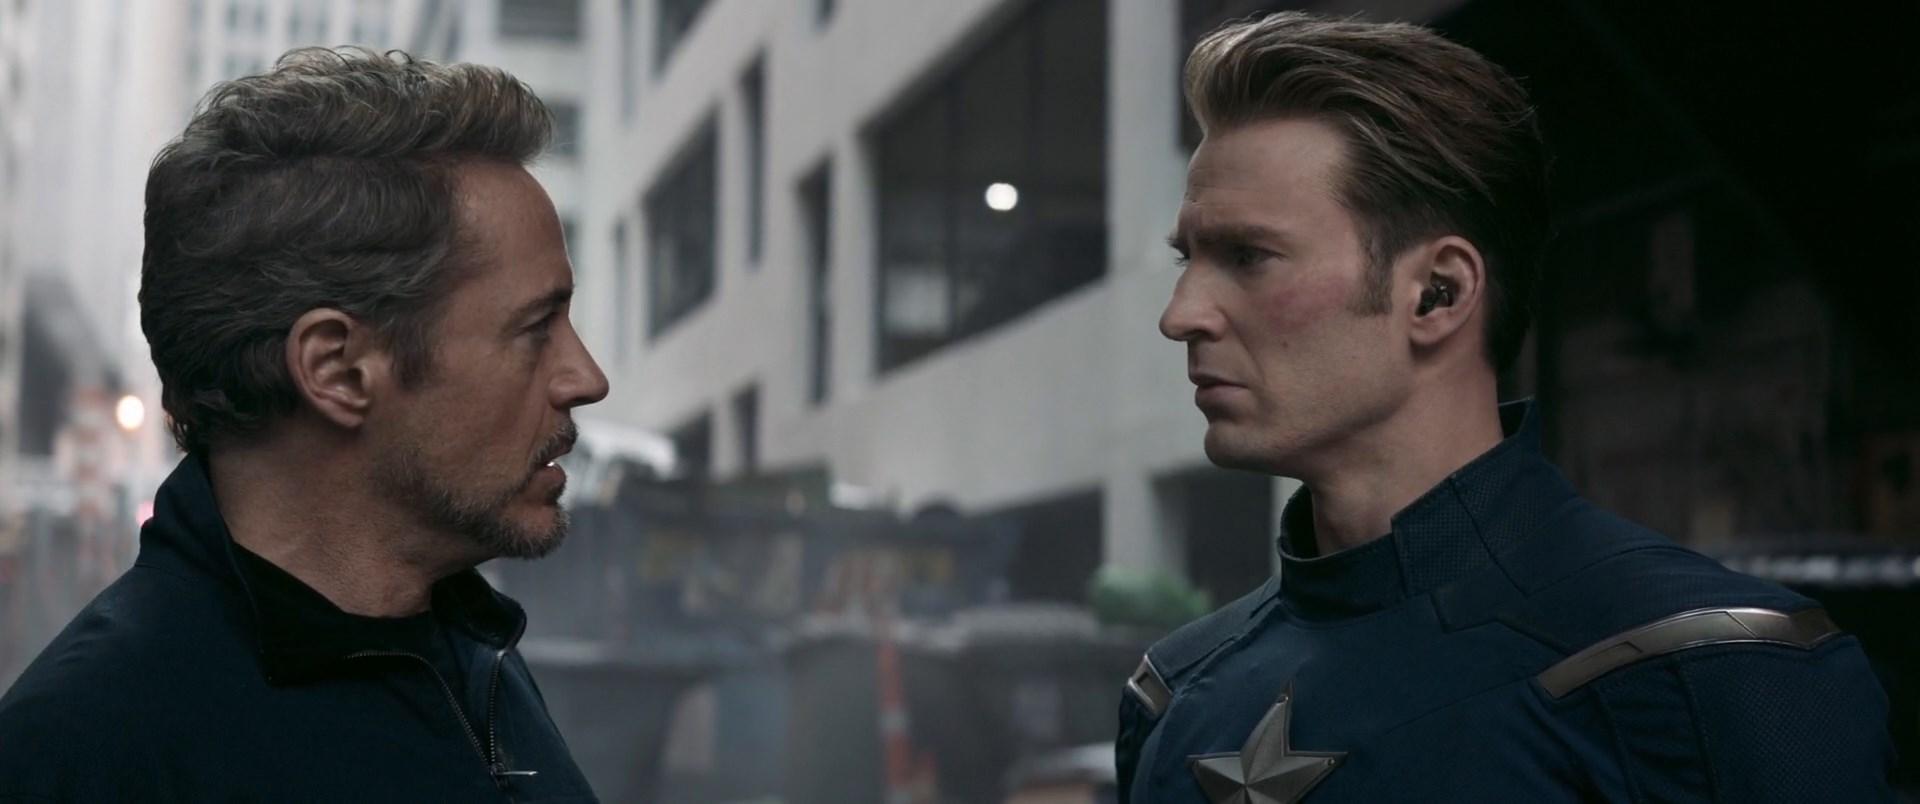 Yenilmezler 4: Son Oyun | Avengers 4: End Game | 2019 | BDRip | XviD | Türkçe Dublaj | 4K - 1080p - m720p - m1080p | BluRay | Dual | TR-EN | Tek Link